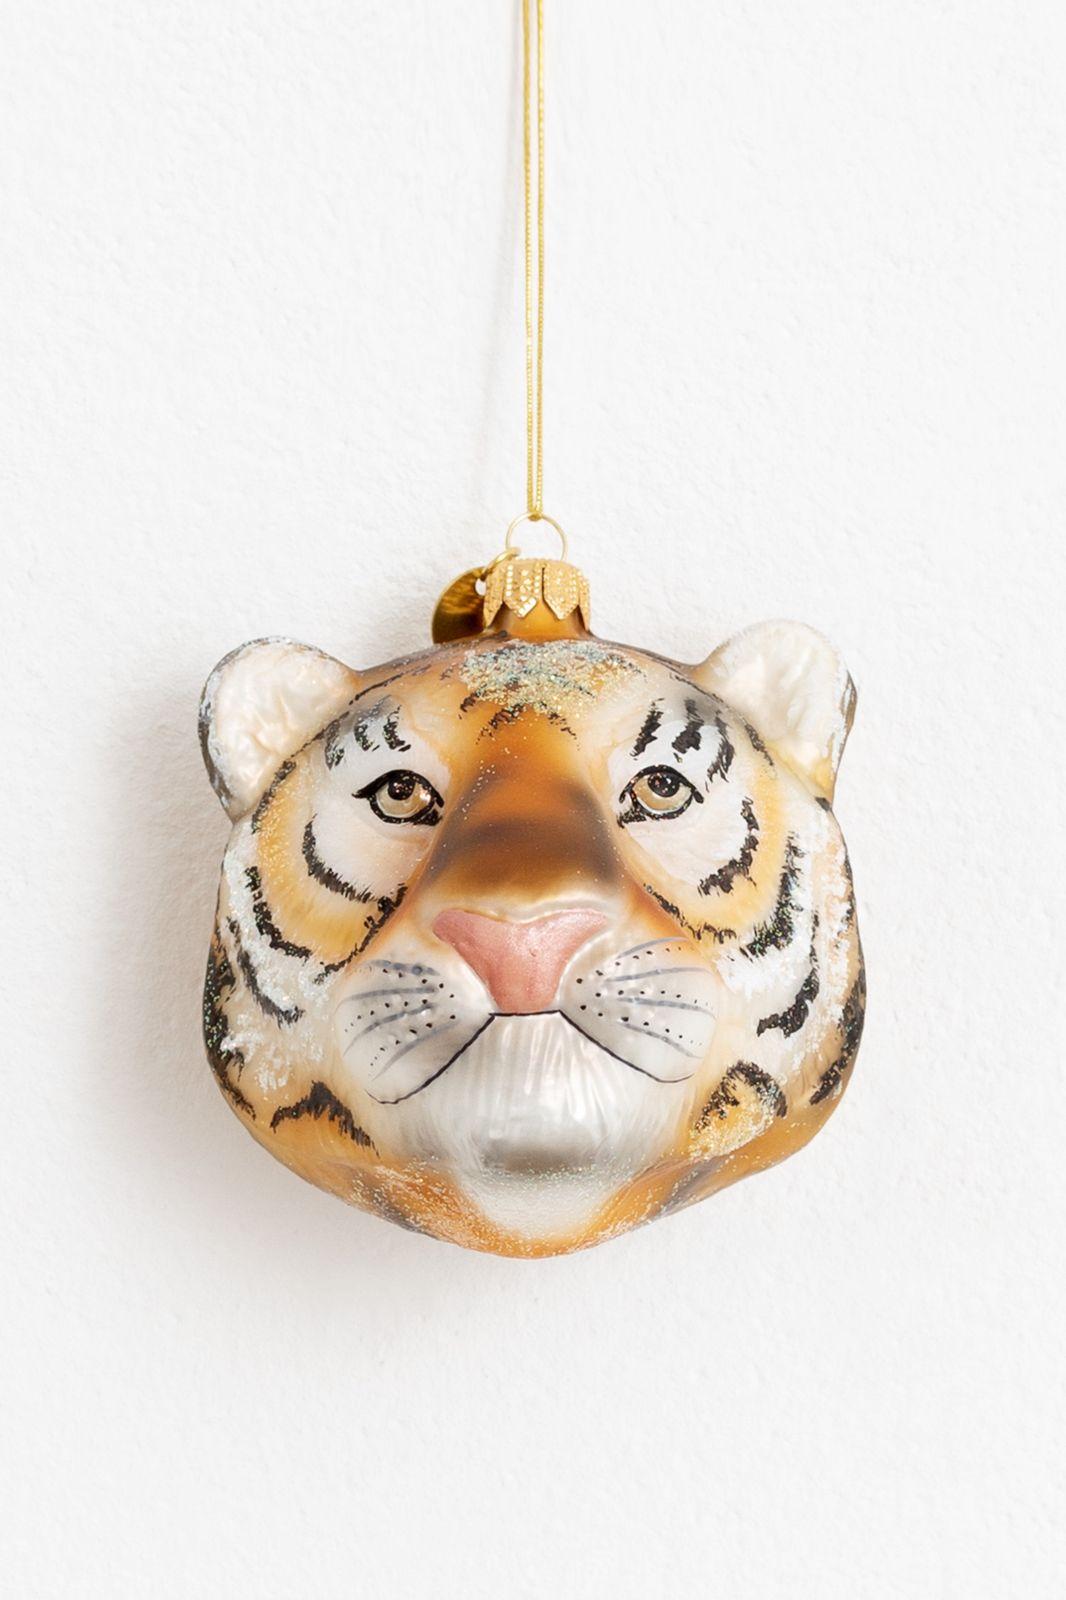 Kerst ornament tijger kop - Homeland | Sissy-Boy